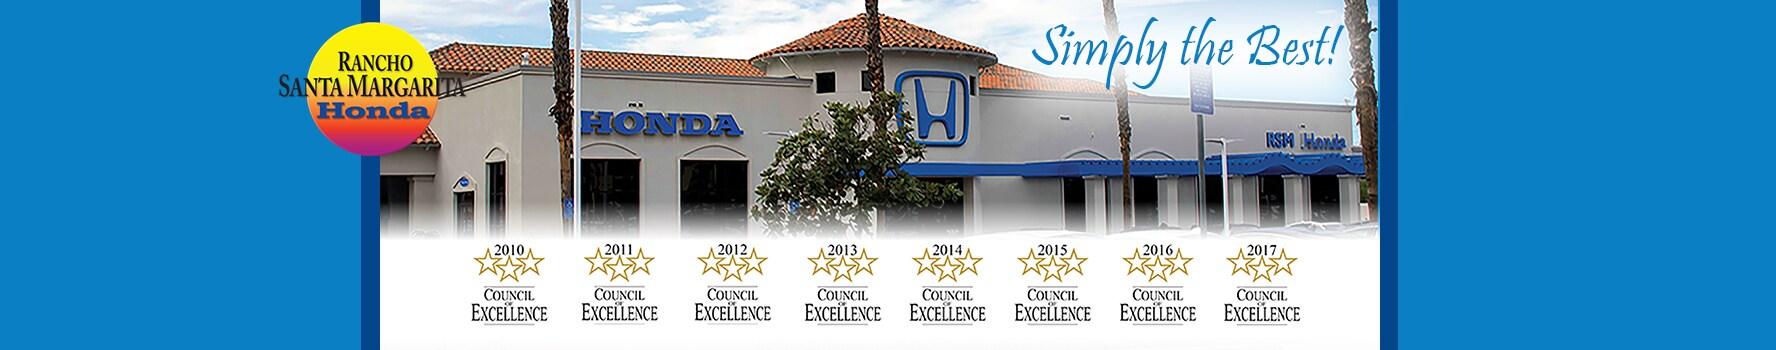 Honda Dealer Orange County | Rancho Santa Margarita Honda